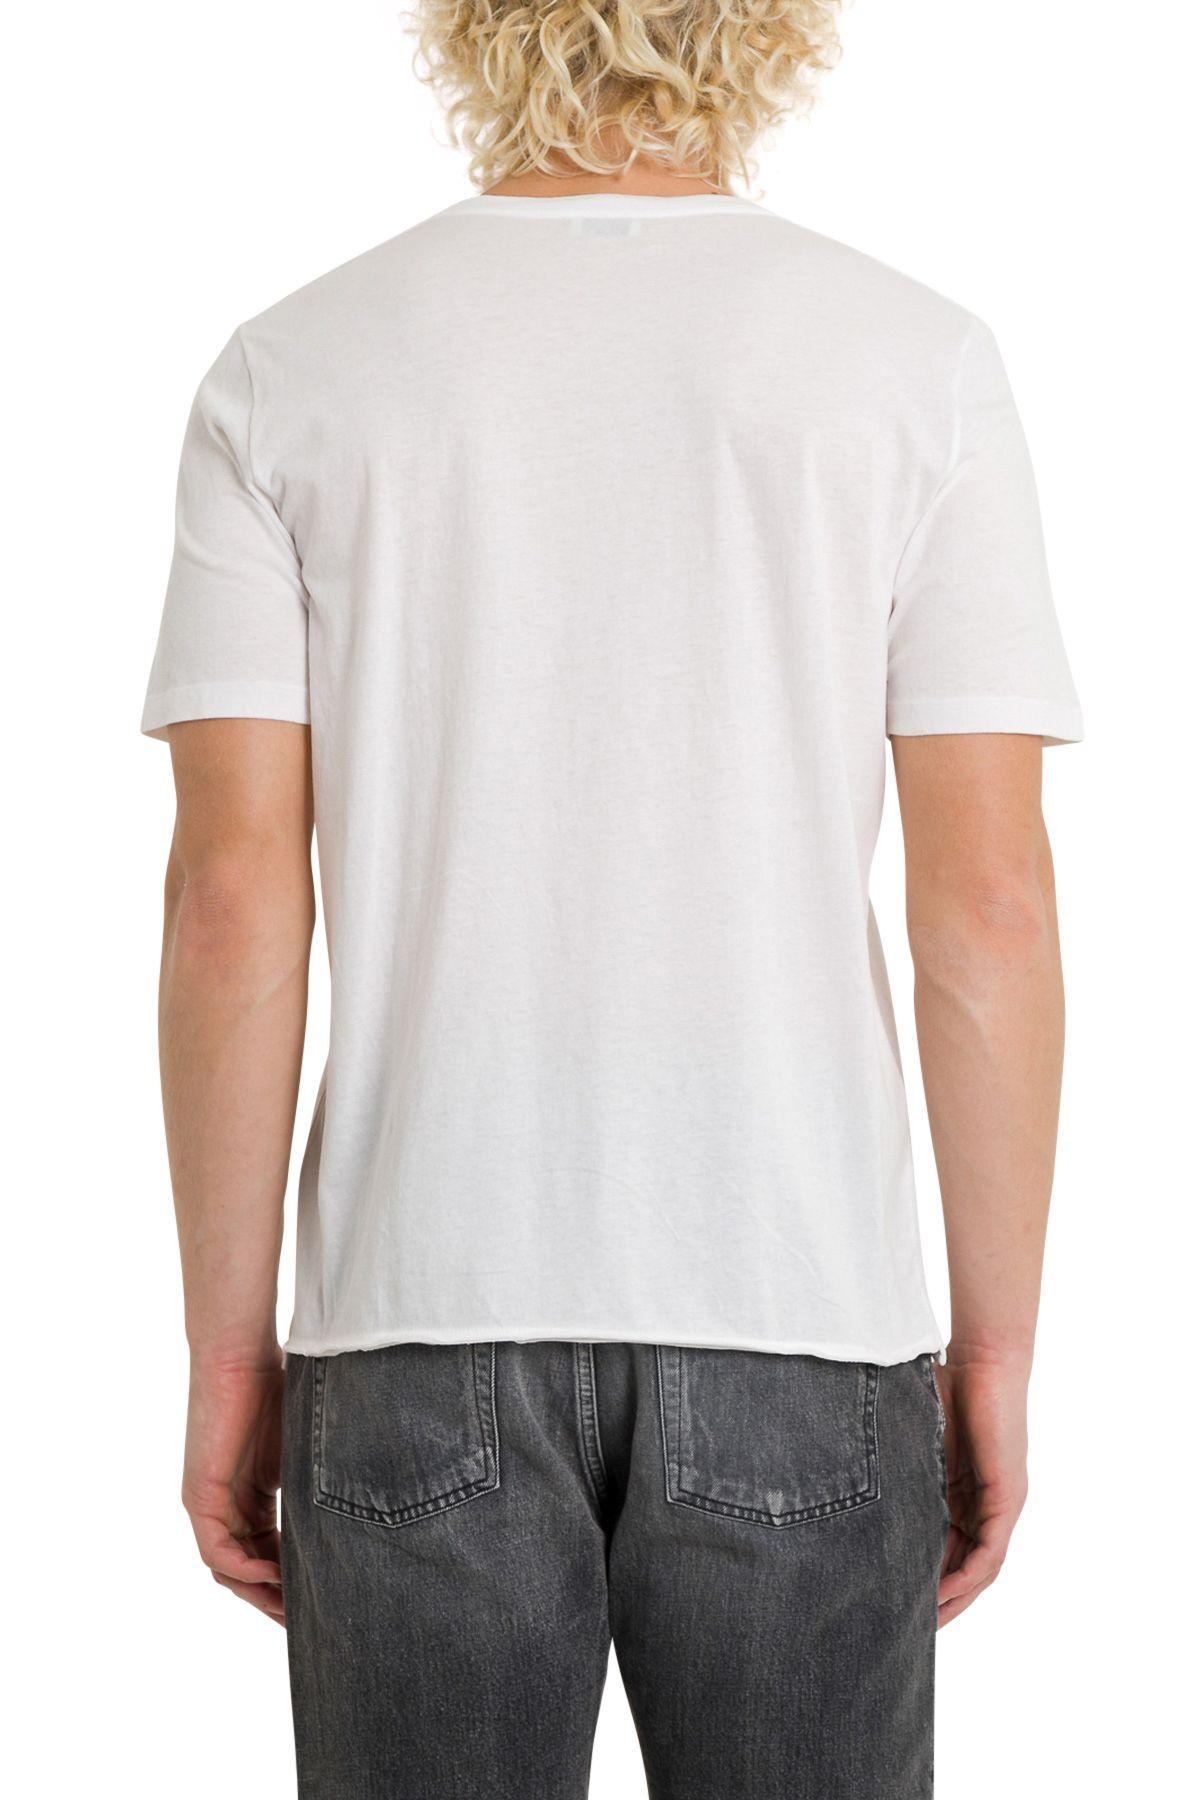 saint laurent saint laurent t shirt with logo animalier. Black Bedroom Furniture Sets. Home Design Ideas